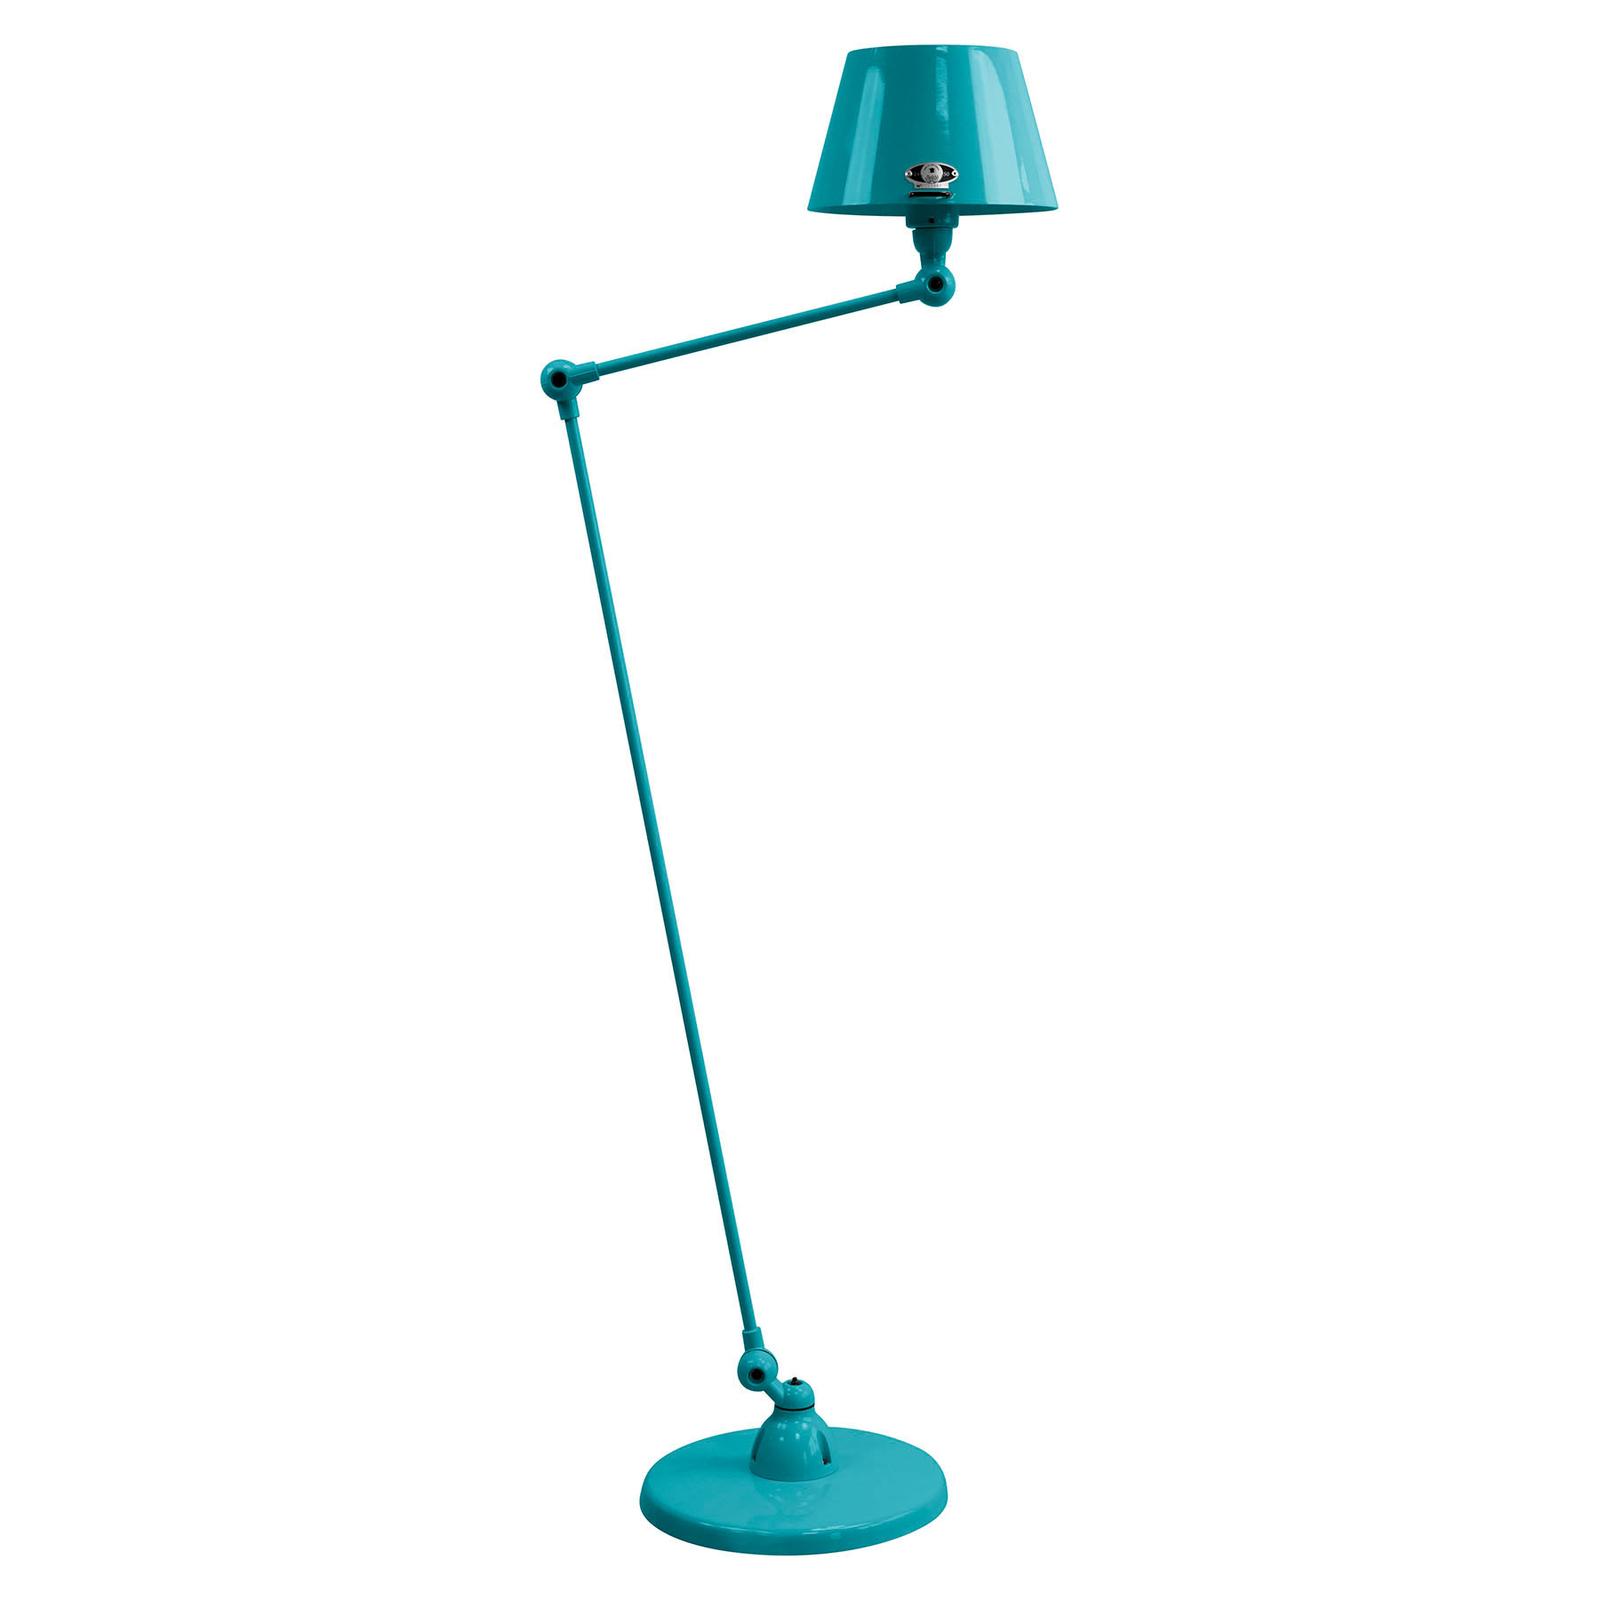 Jieldé Aicler AID833 80+30 lampa stojąca błękitna